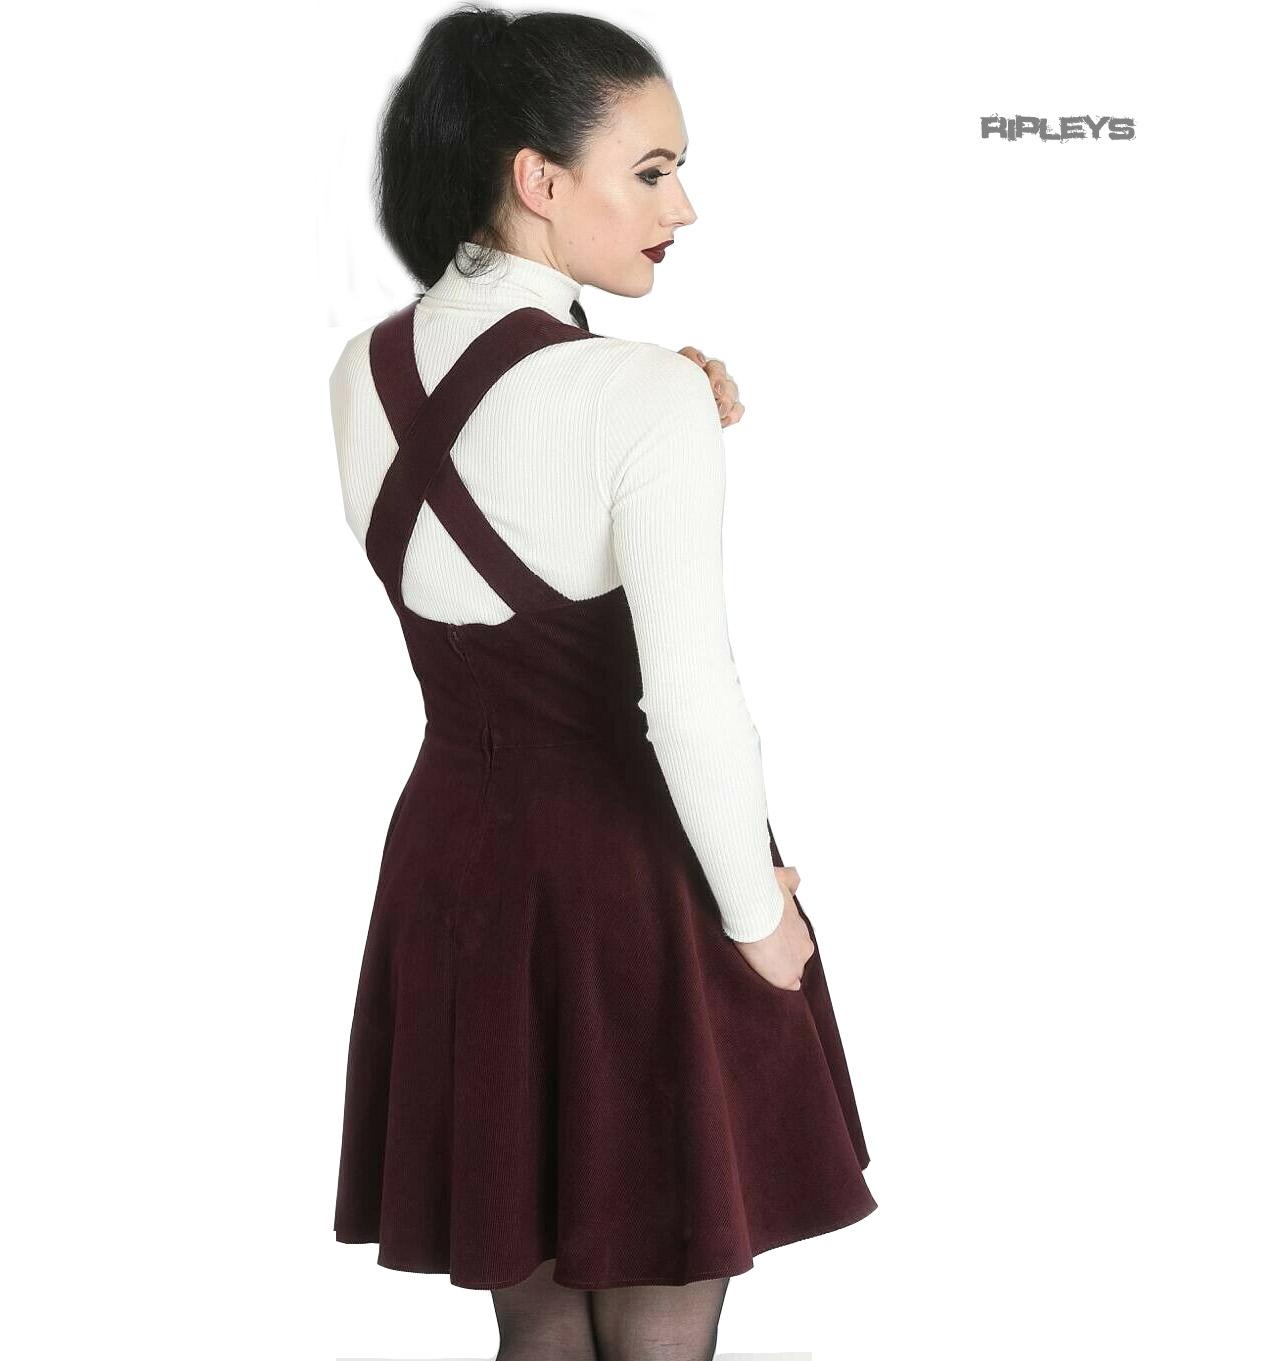 Hell-Bunny-Rockabilly-Corduroy-Mini-Dress-WONDER-YEARS-Pinafore-Wine-All-Sizes thumbnail 4